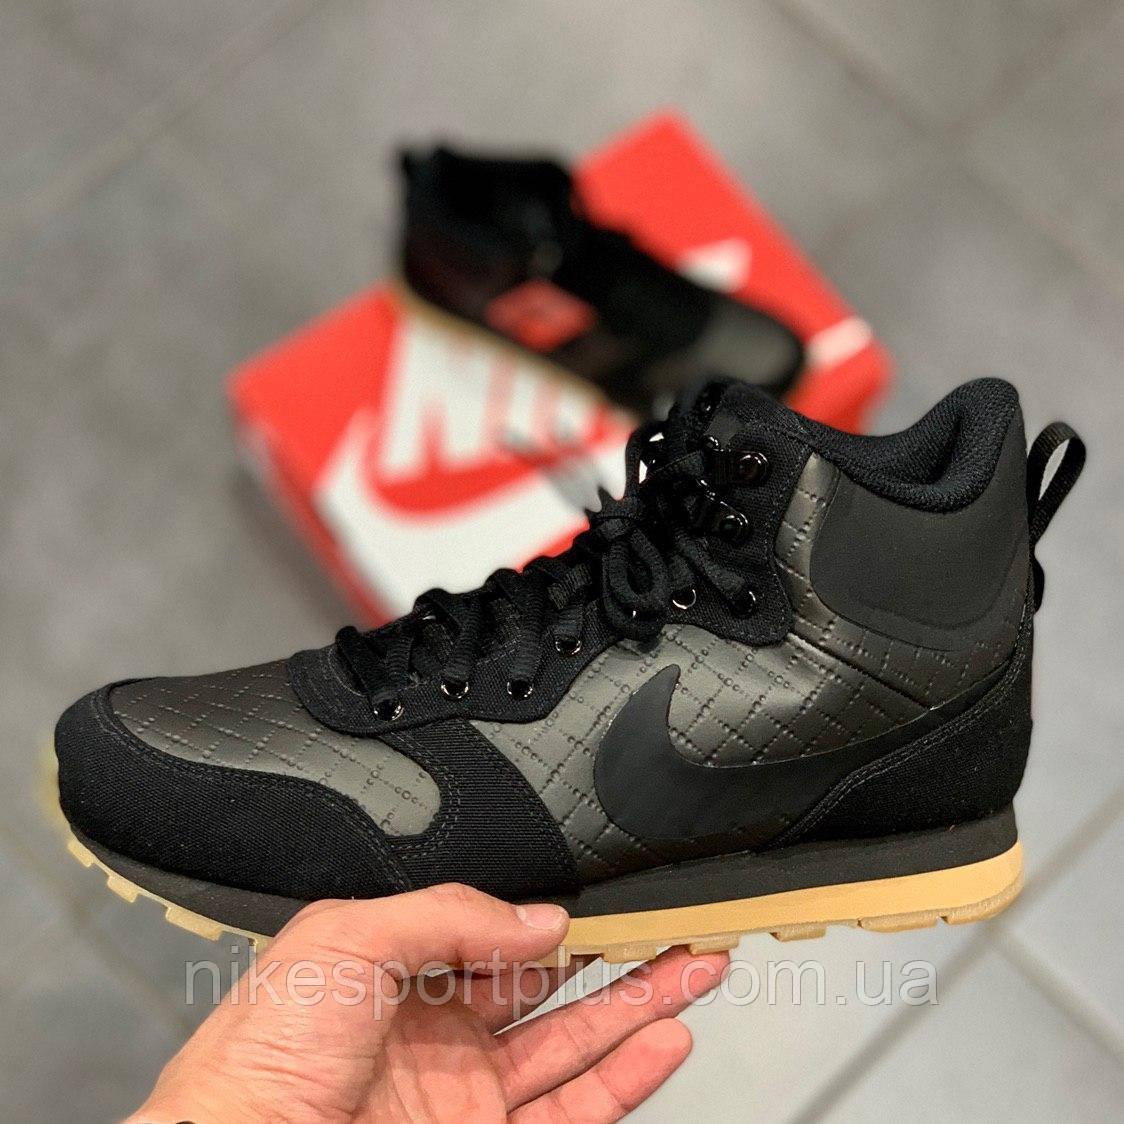 КРОССОВКИ Men's Nike MD Runner 2 Mid Premium Shoe 844864-006